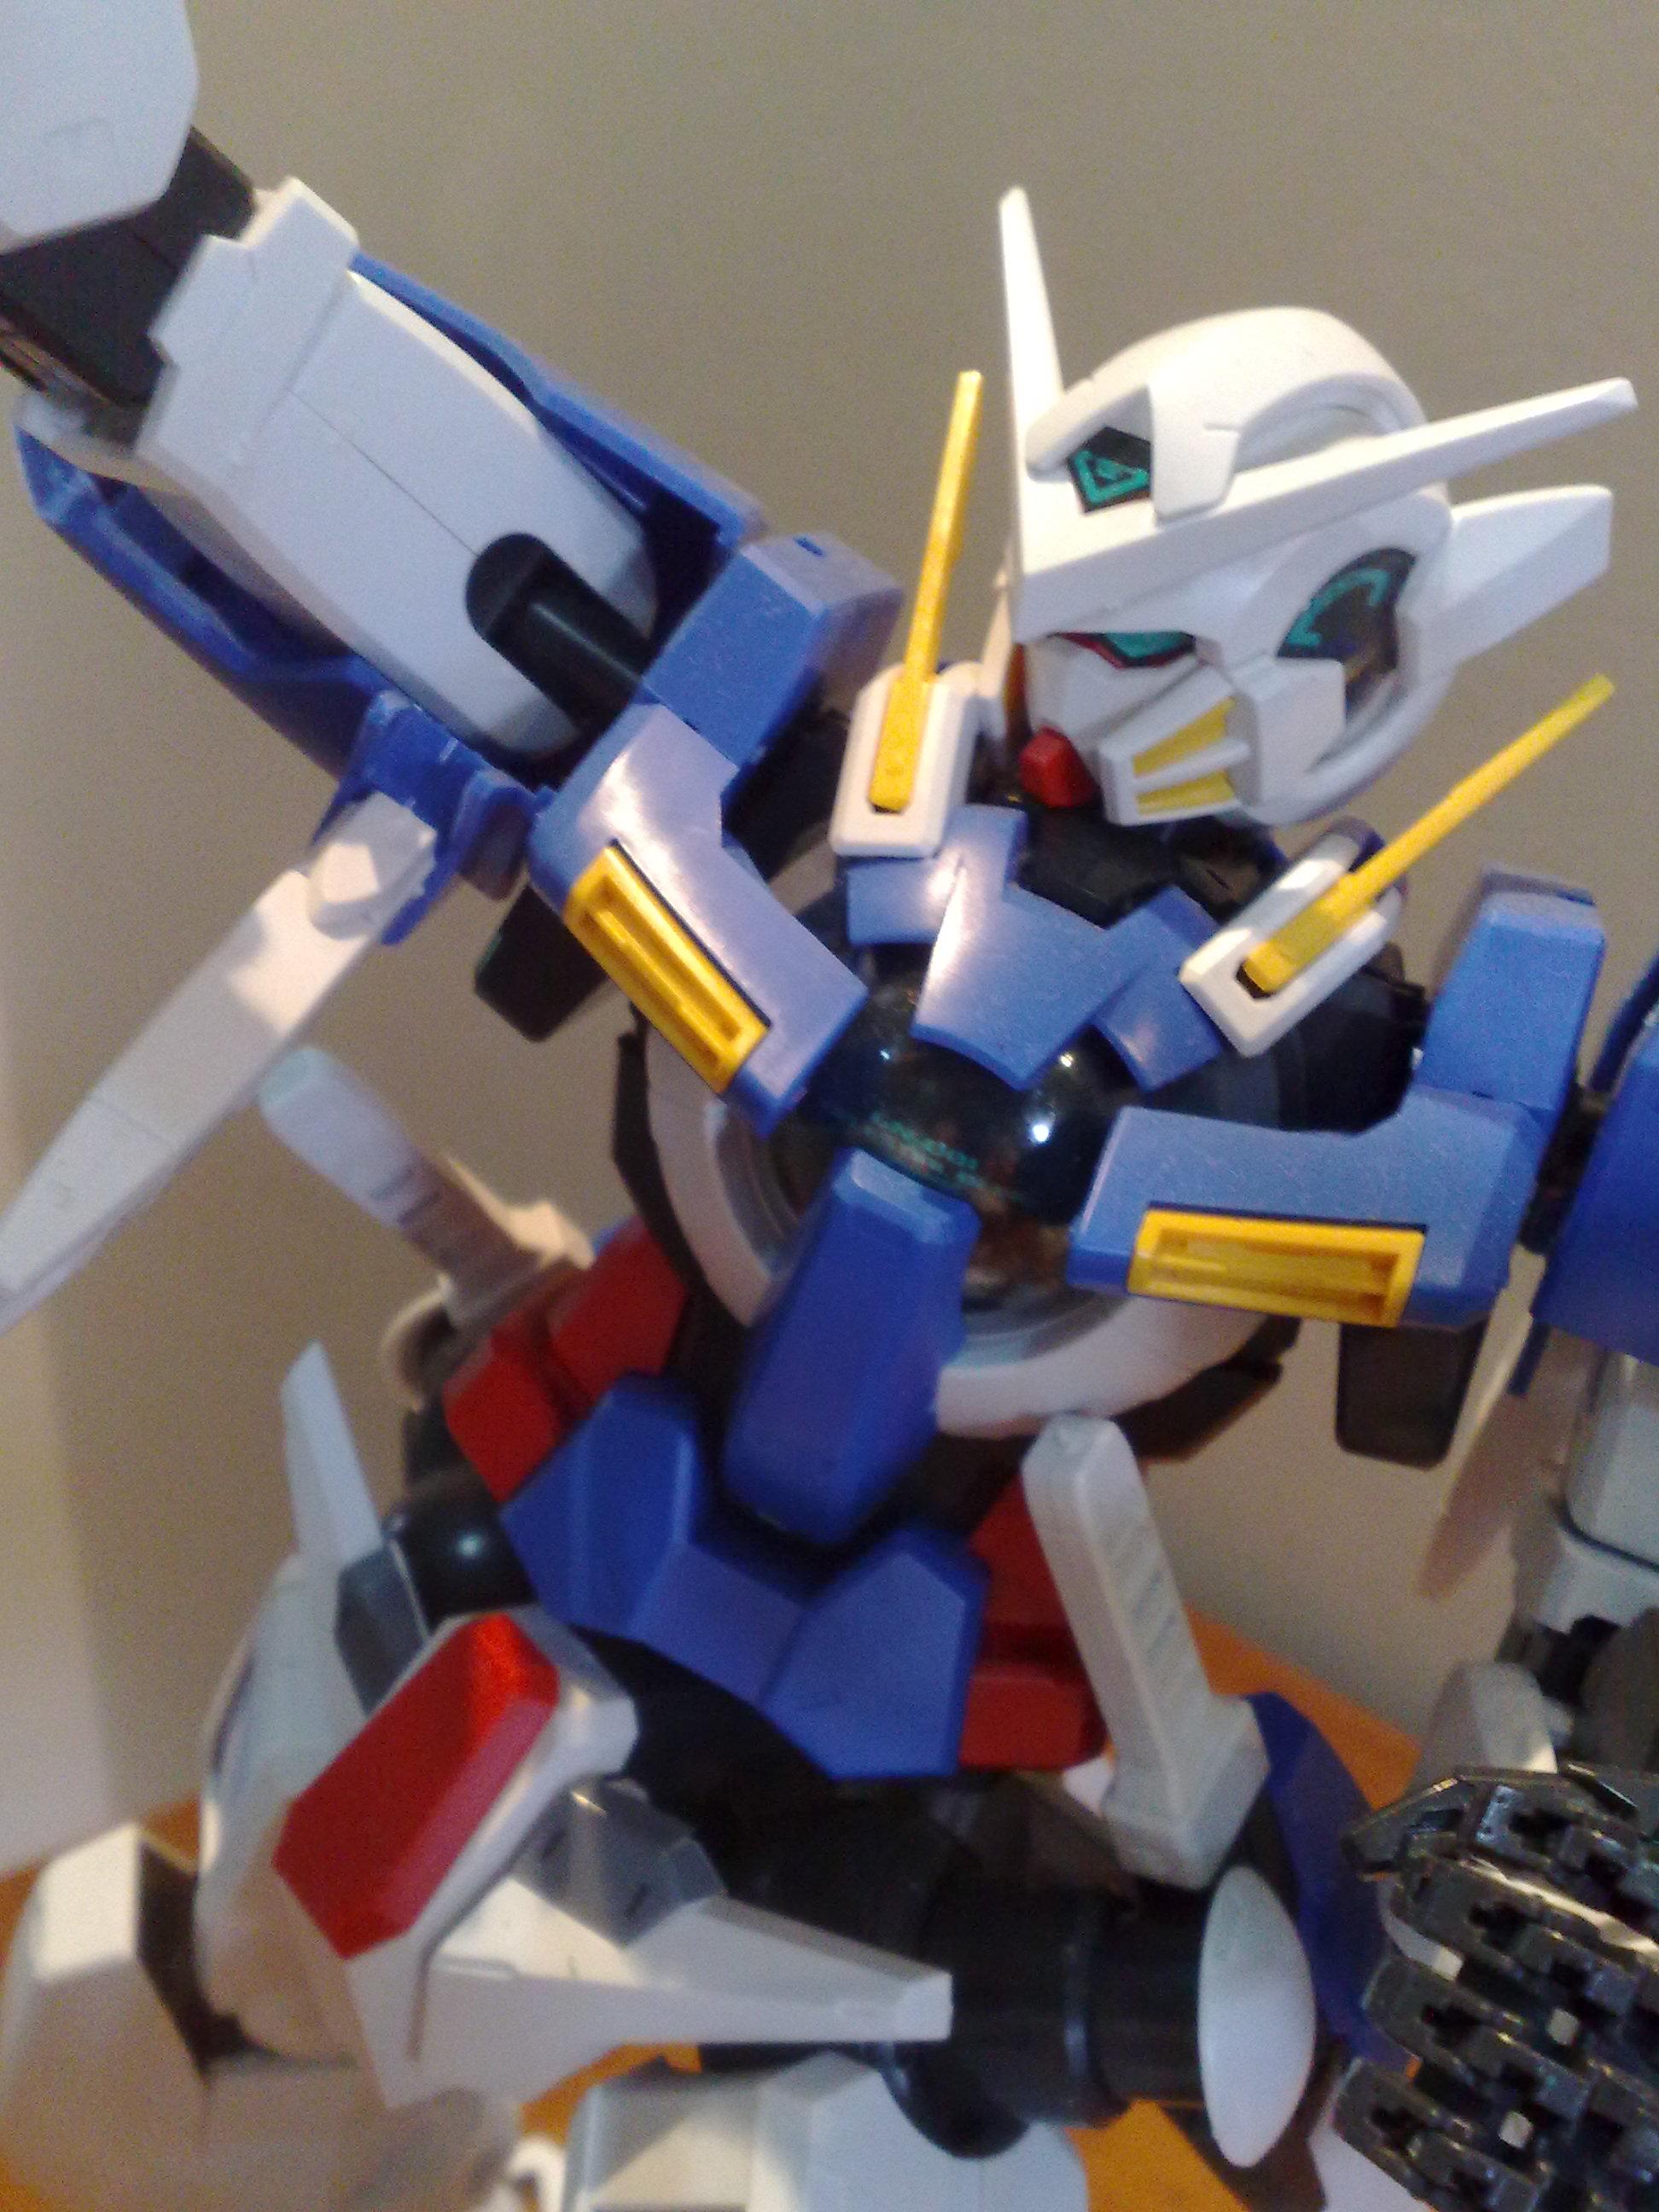 gn 001 exia gundam 1/60 scale model